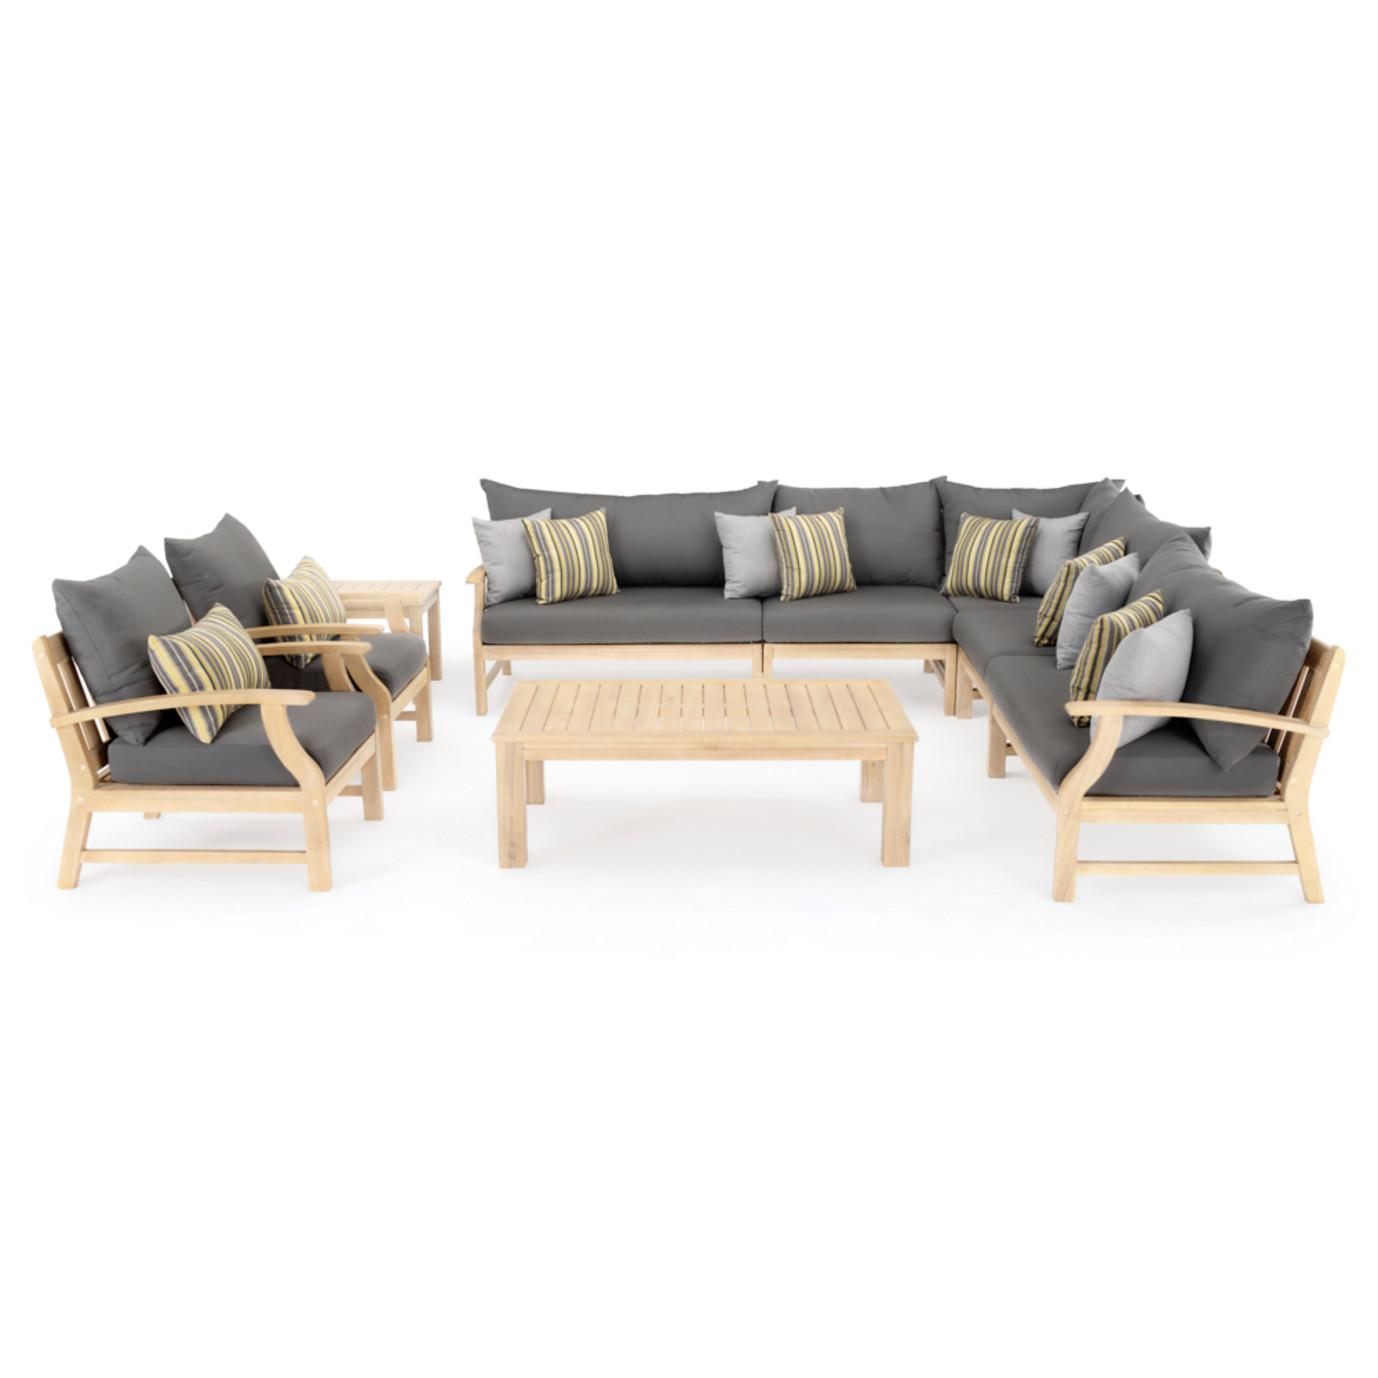 Kooper 9 Piece Seating Set - Charcoal Gray